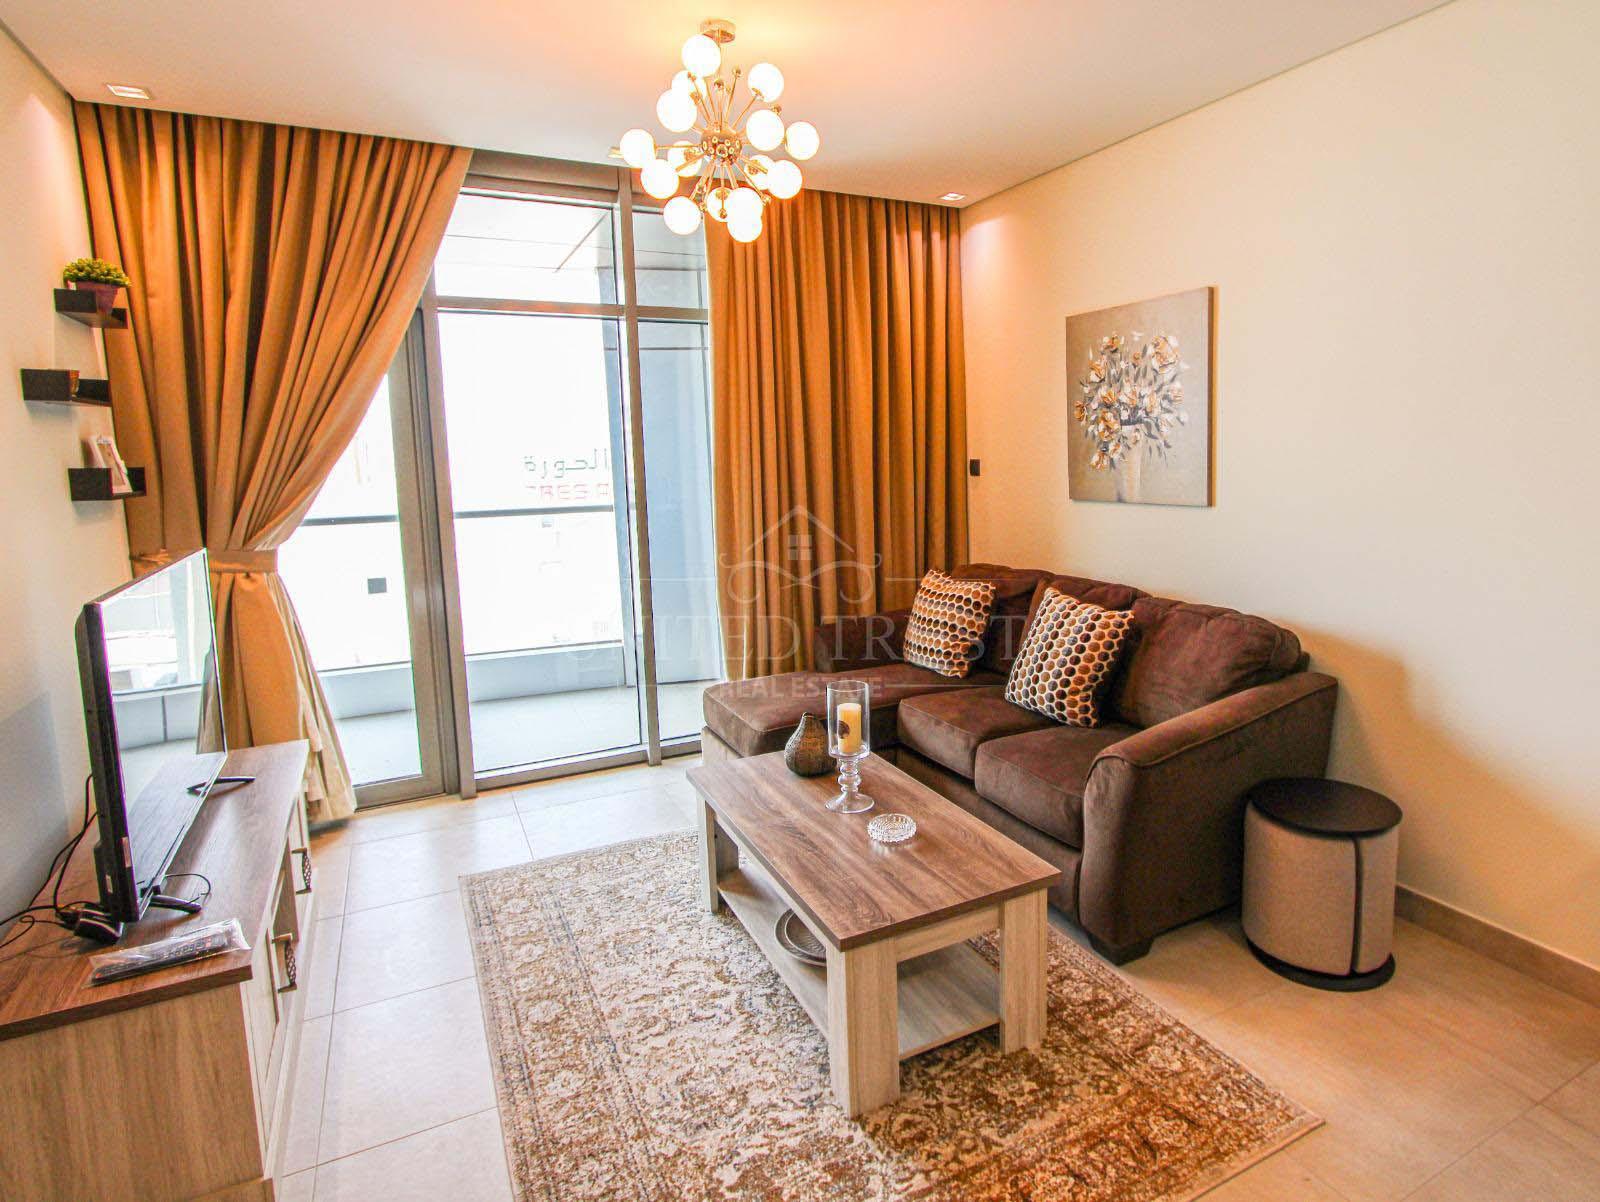 For rent a fully furnished 1 bedroom flat in Hoora Ref: HOO-AZ-002